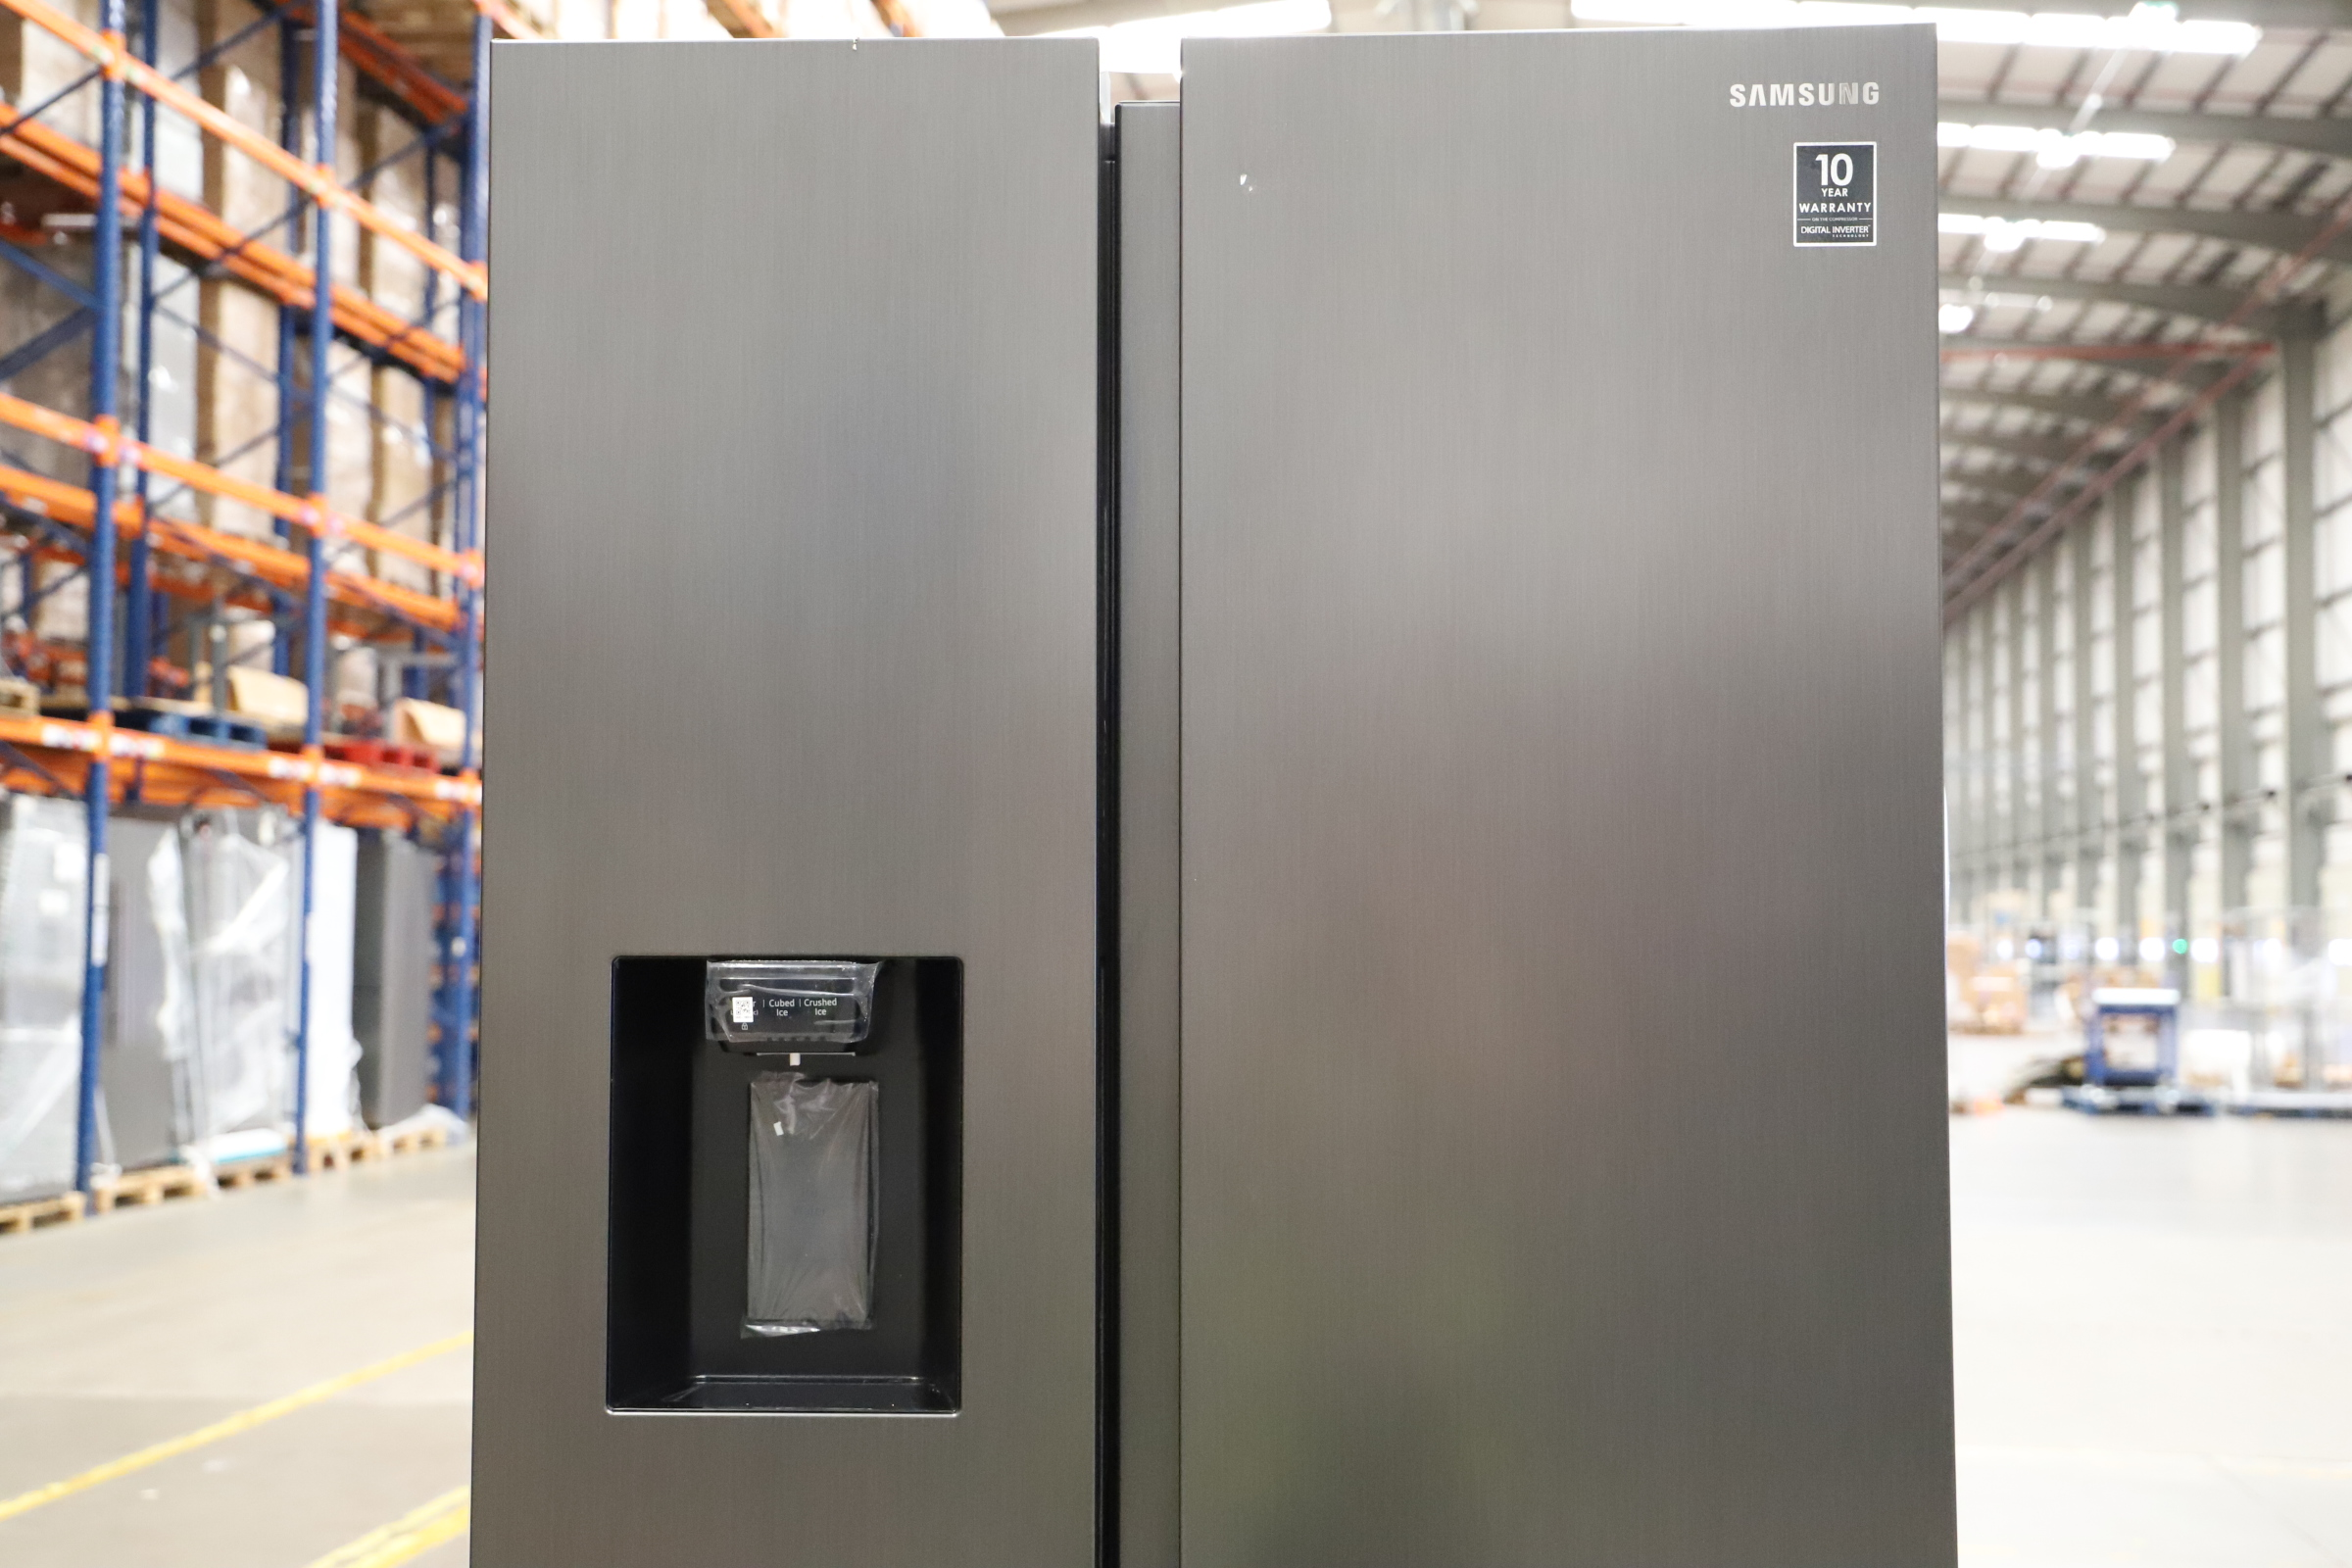 Pallet of 1 Samsung Water & Ice Fridge freezer. Latest selling price £1,799.99 - Image 5 of 10